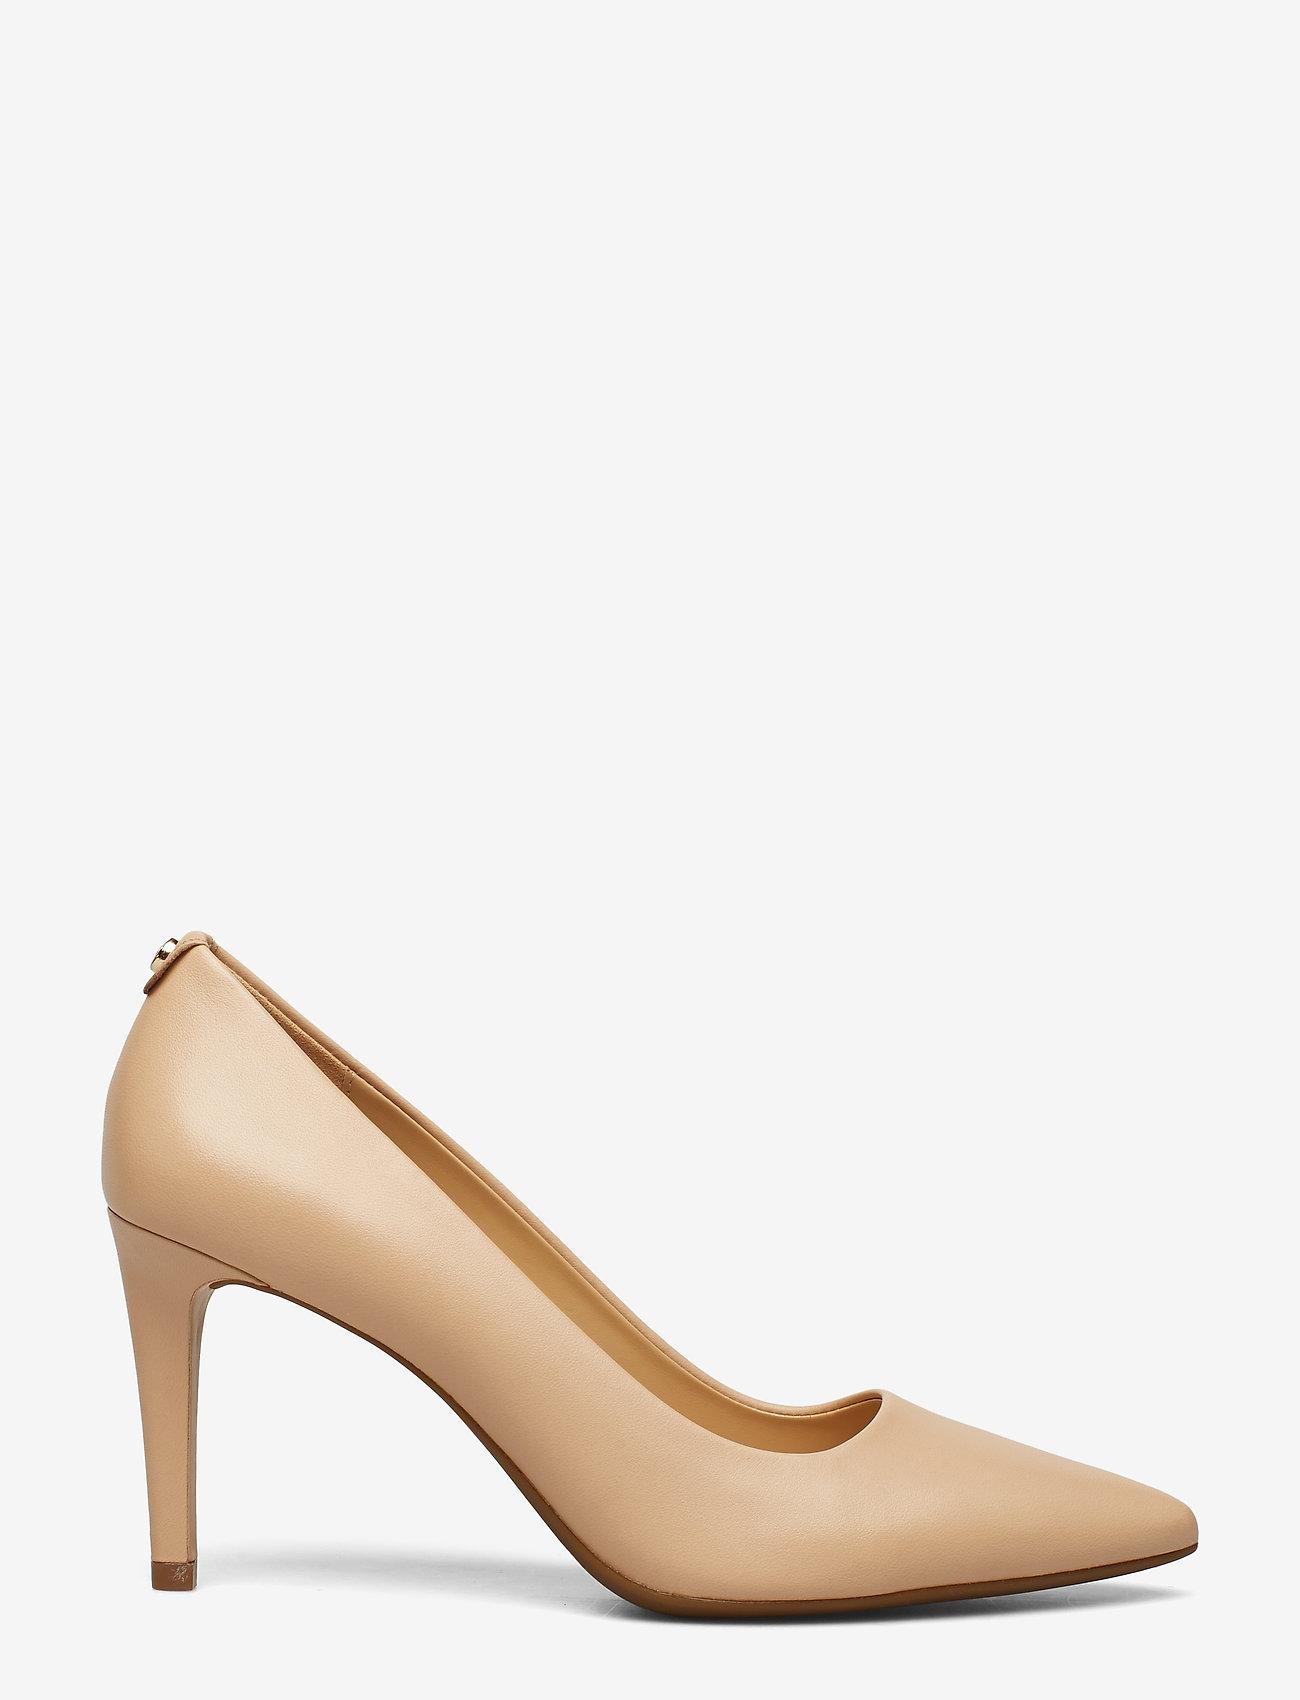 Michael Kors Shoes - DOROTHY FLEX PUMP - klassieke pumps - nude - 1